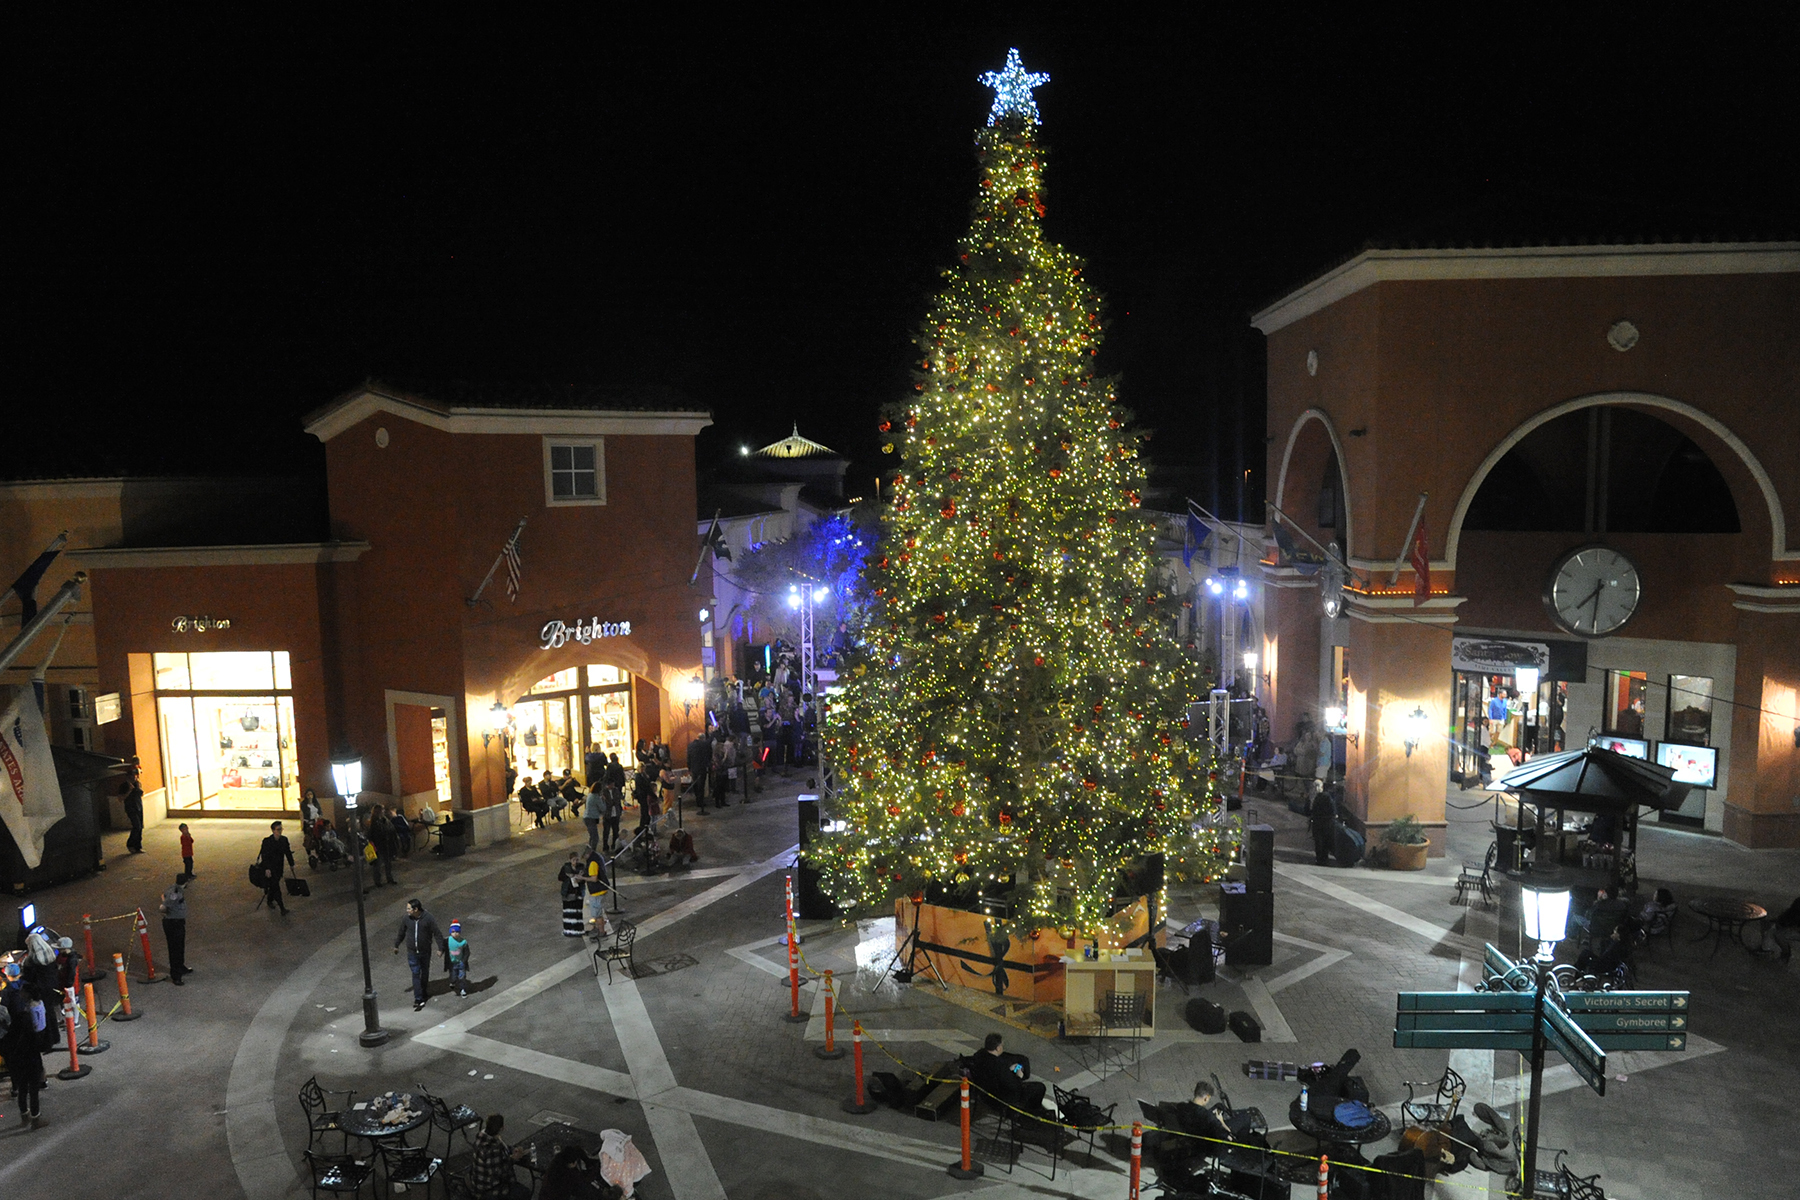 Camarillo Christmas Tree Lighting 2021 Around Town Online December Events Calendar Beyond The Acorn